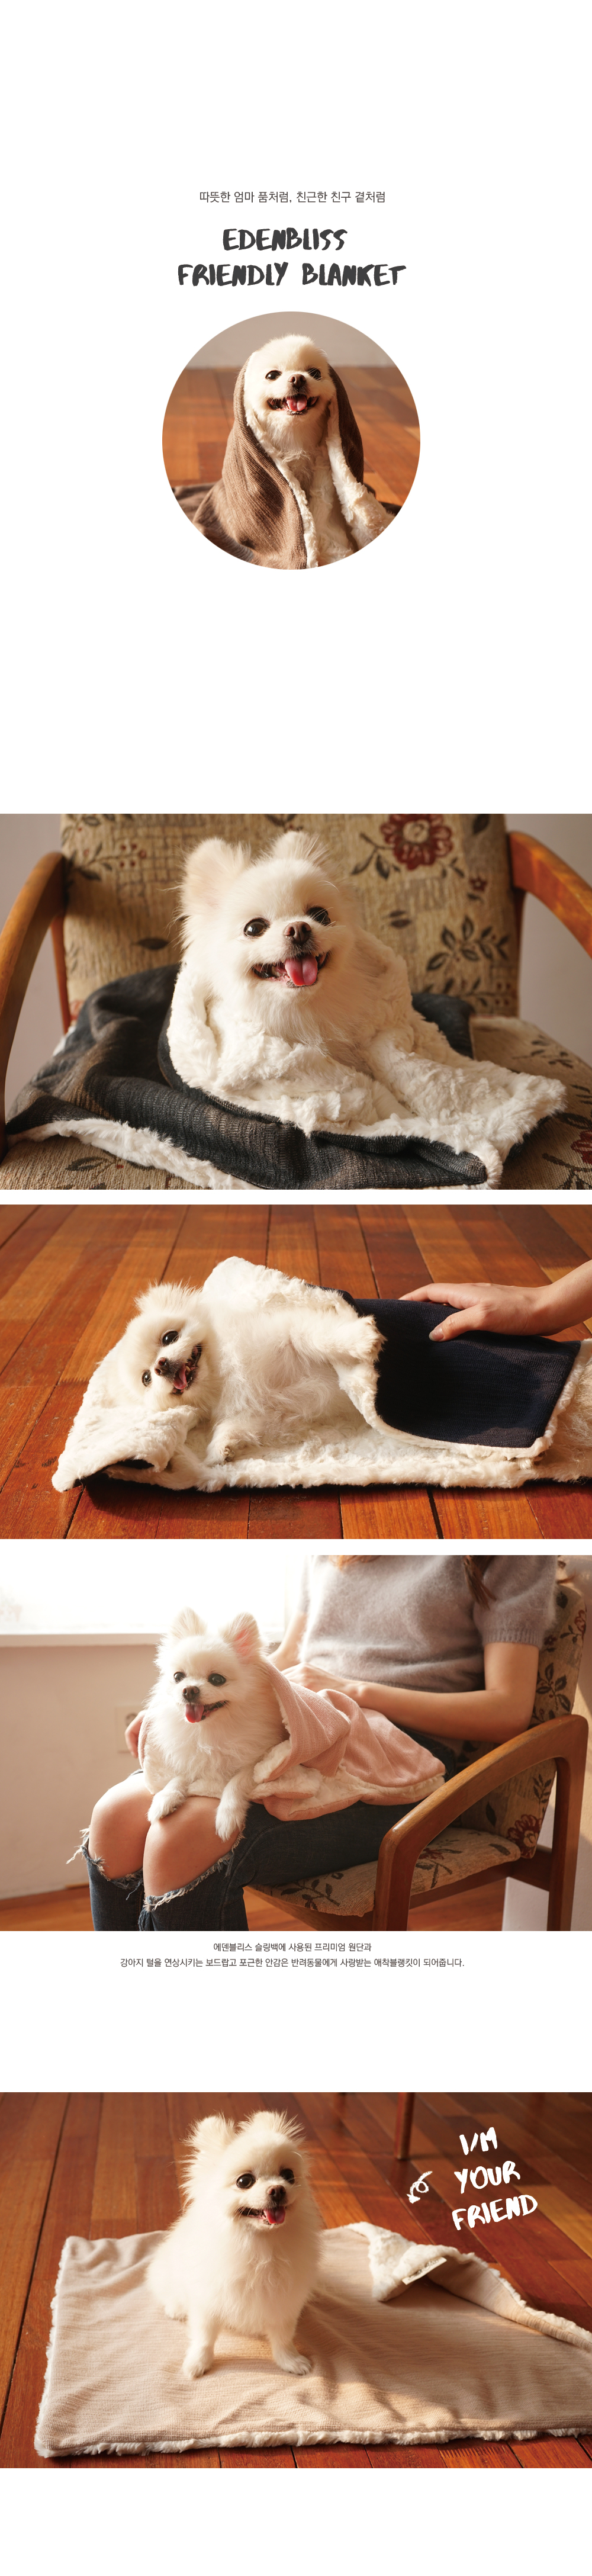 edenbliss 프렌들리 블랭킷 골드베이지-강아지 고양이 담요 이불 - 에덴블리스, 37,000원, 하우스/식기/실내용품, 방석/매트